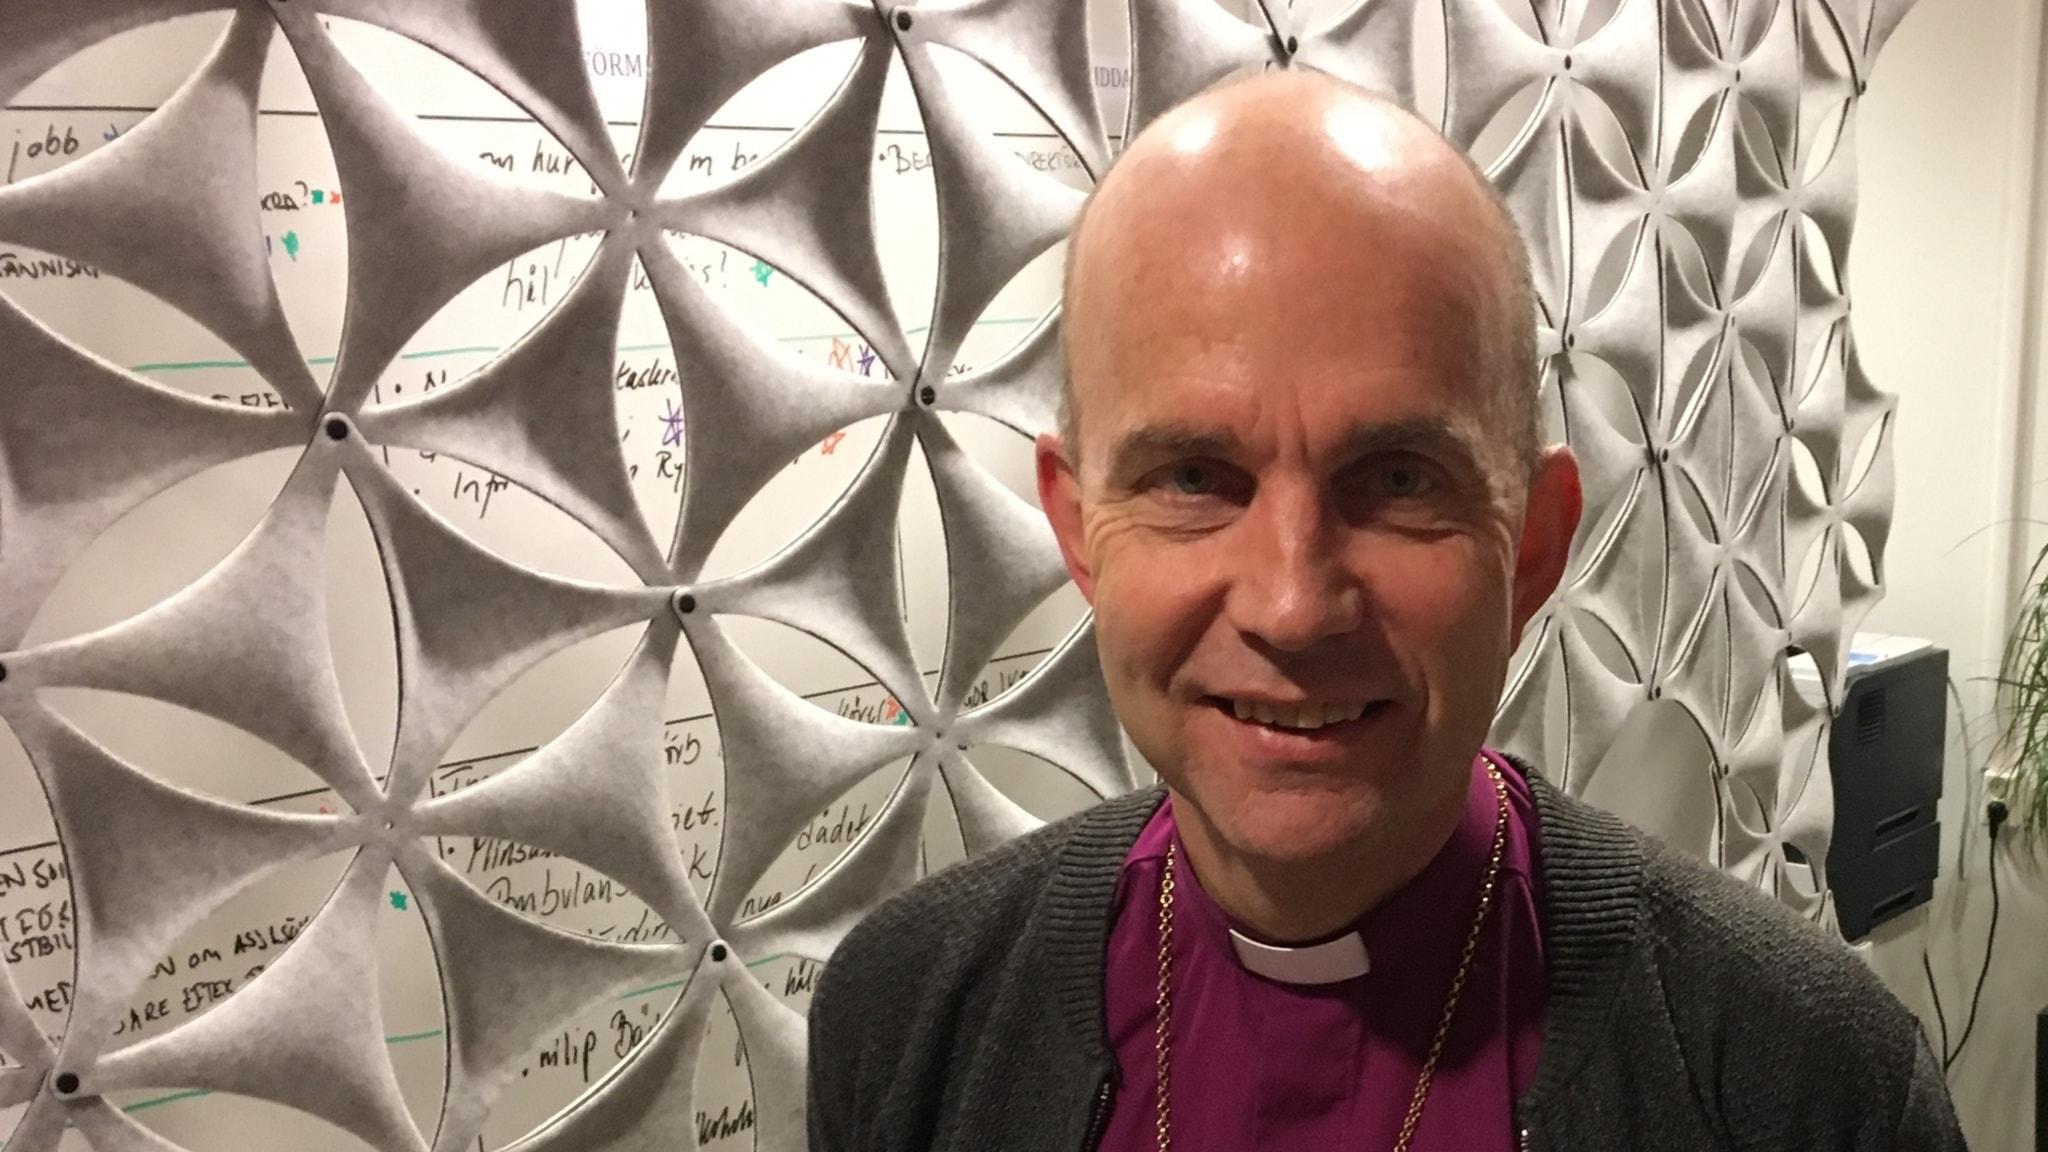 Biskopen Fredrik Modeus snackar om Martin Luther och hans 95 teser som fyller 500 år